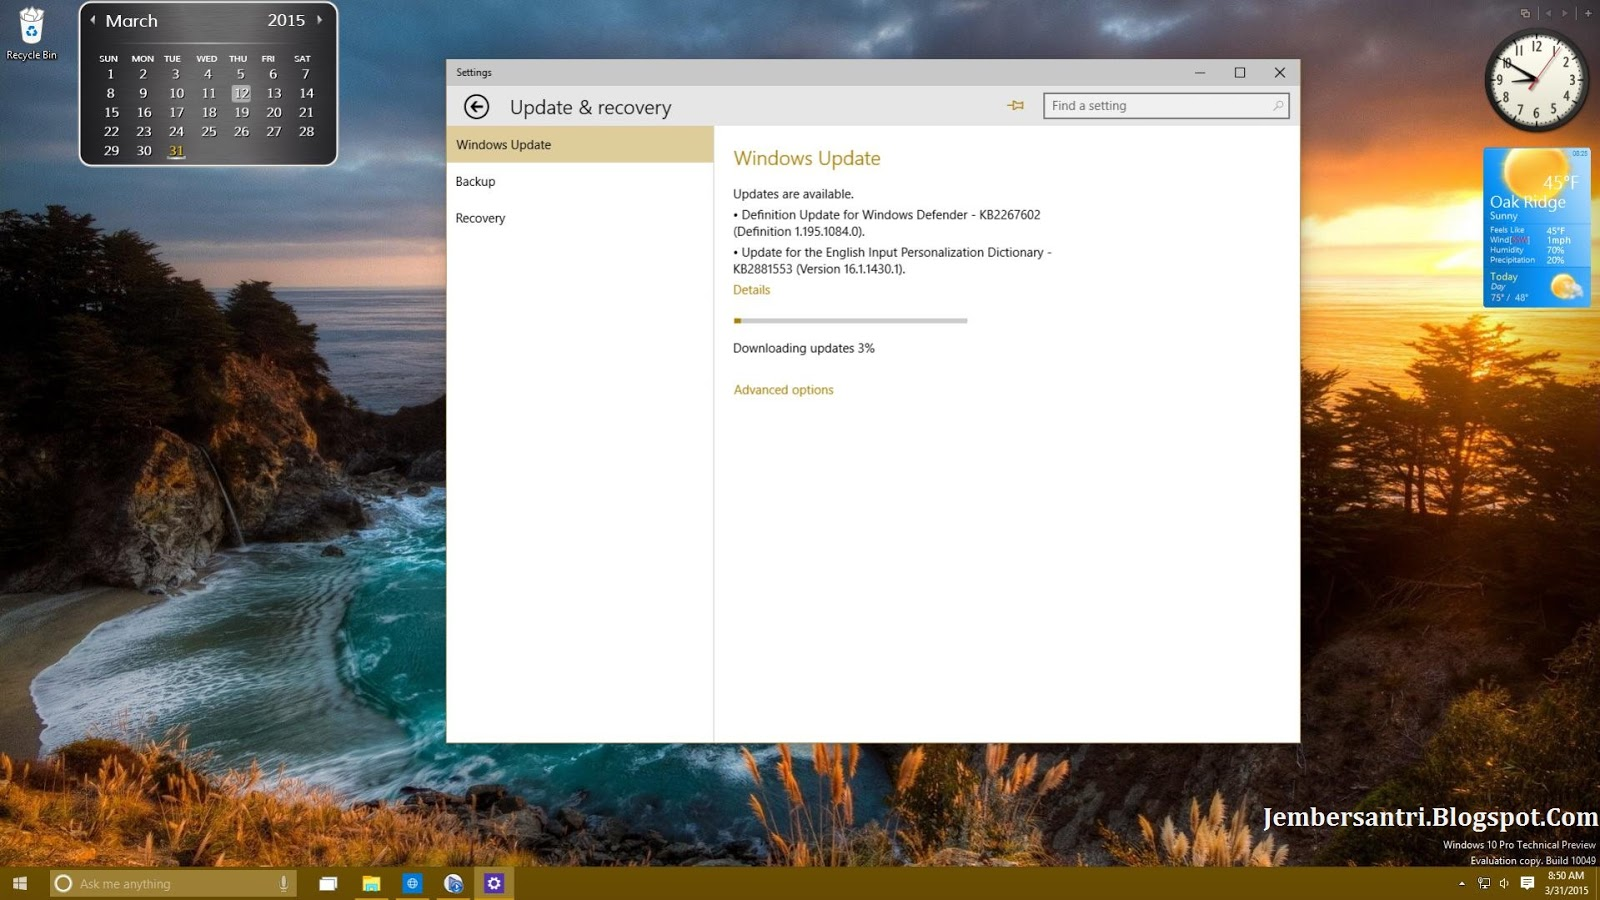 Windows 10 Pro Preview Build 10049 x86 x64 March 2015 screenshot 2 - http://jembersantri.blogspot.com